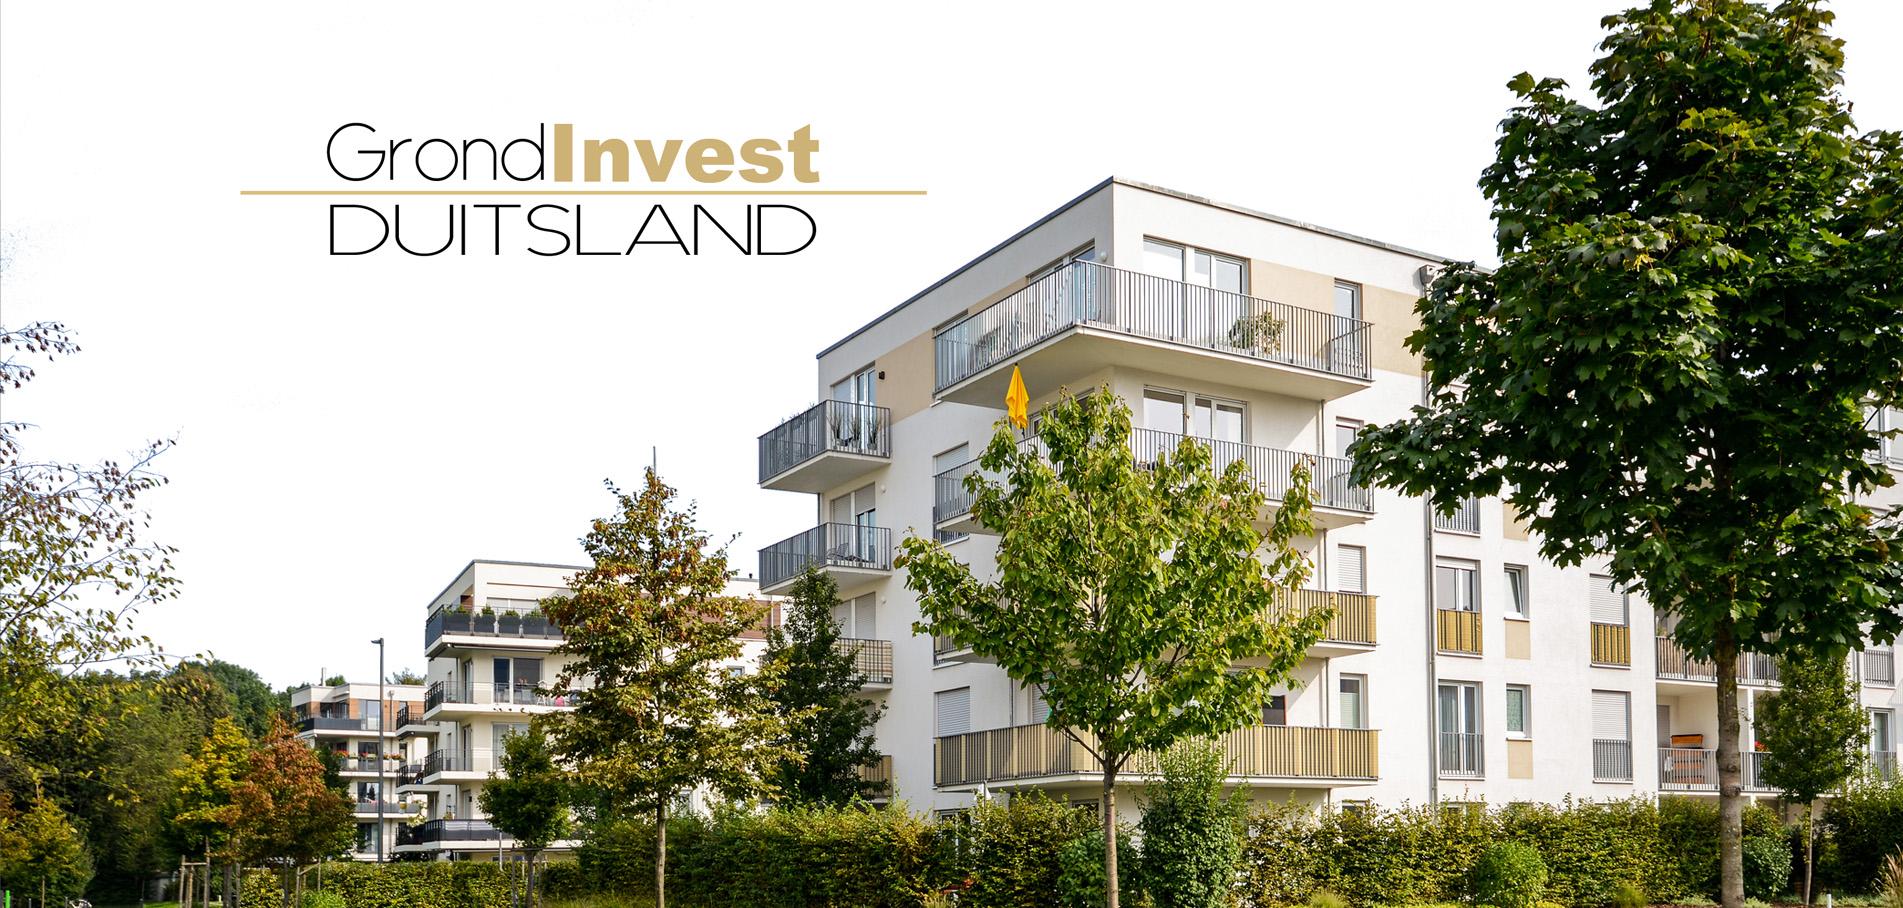 Mehrfamilienhäuser - GrondInvest